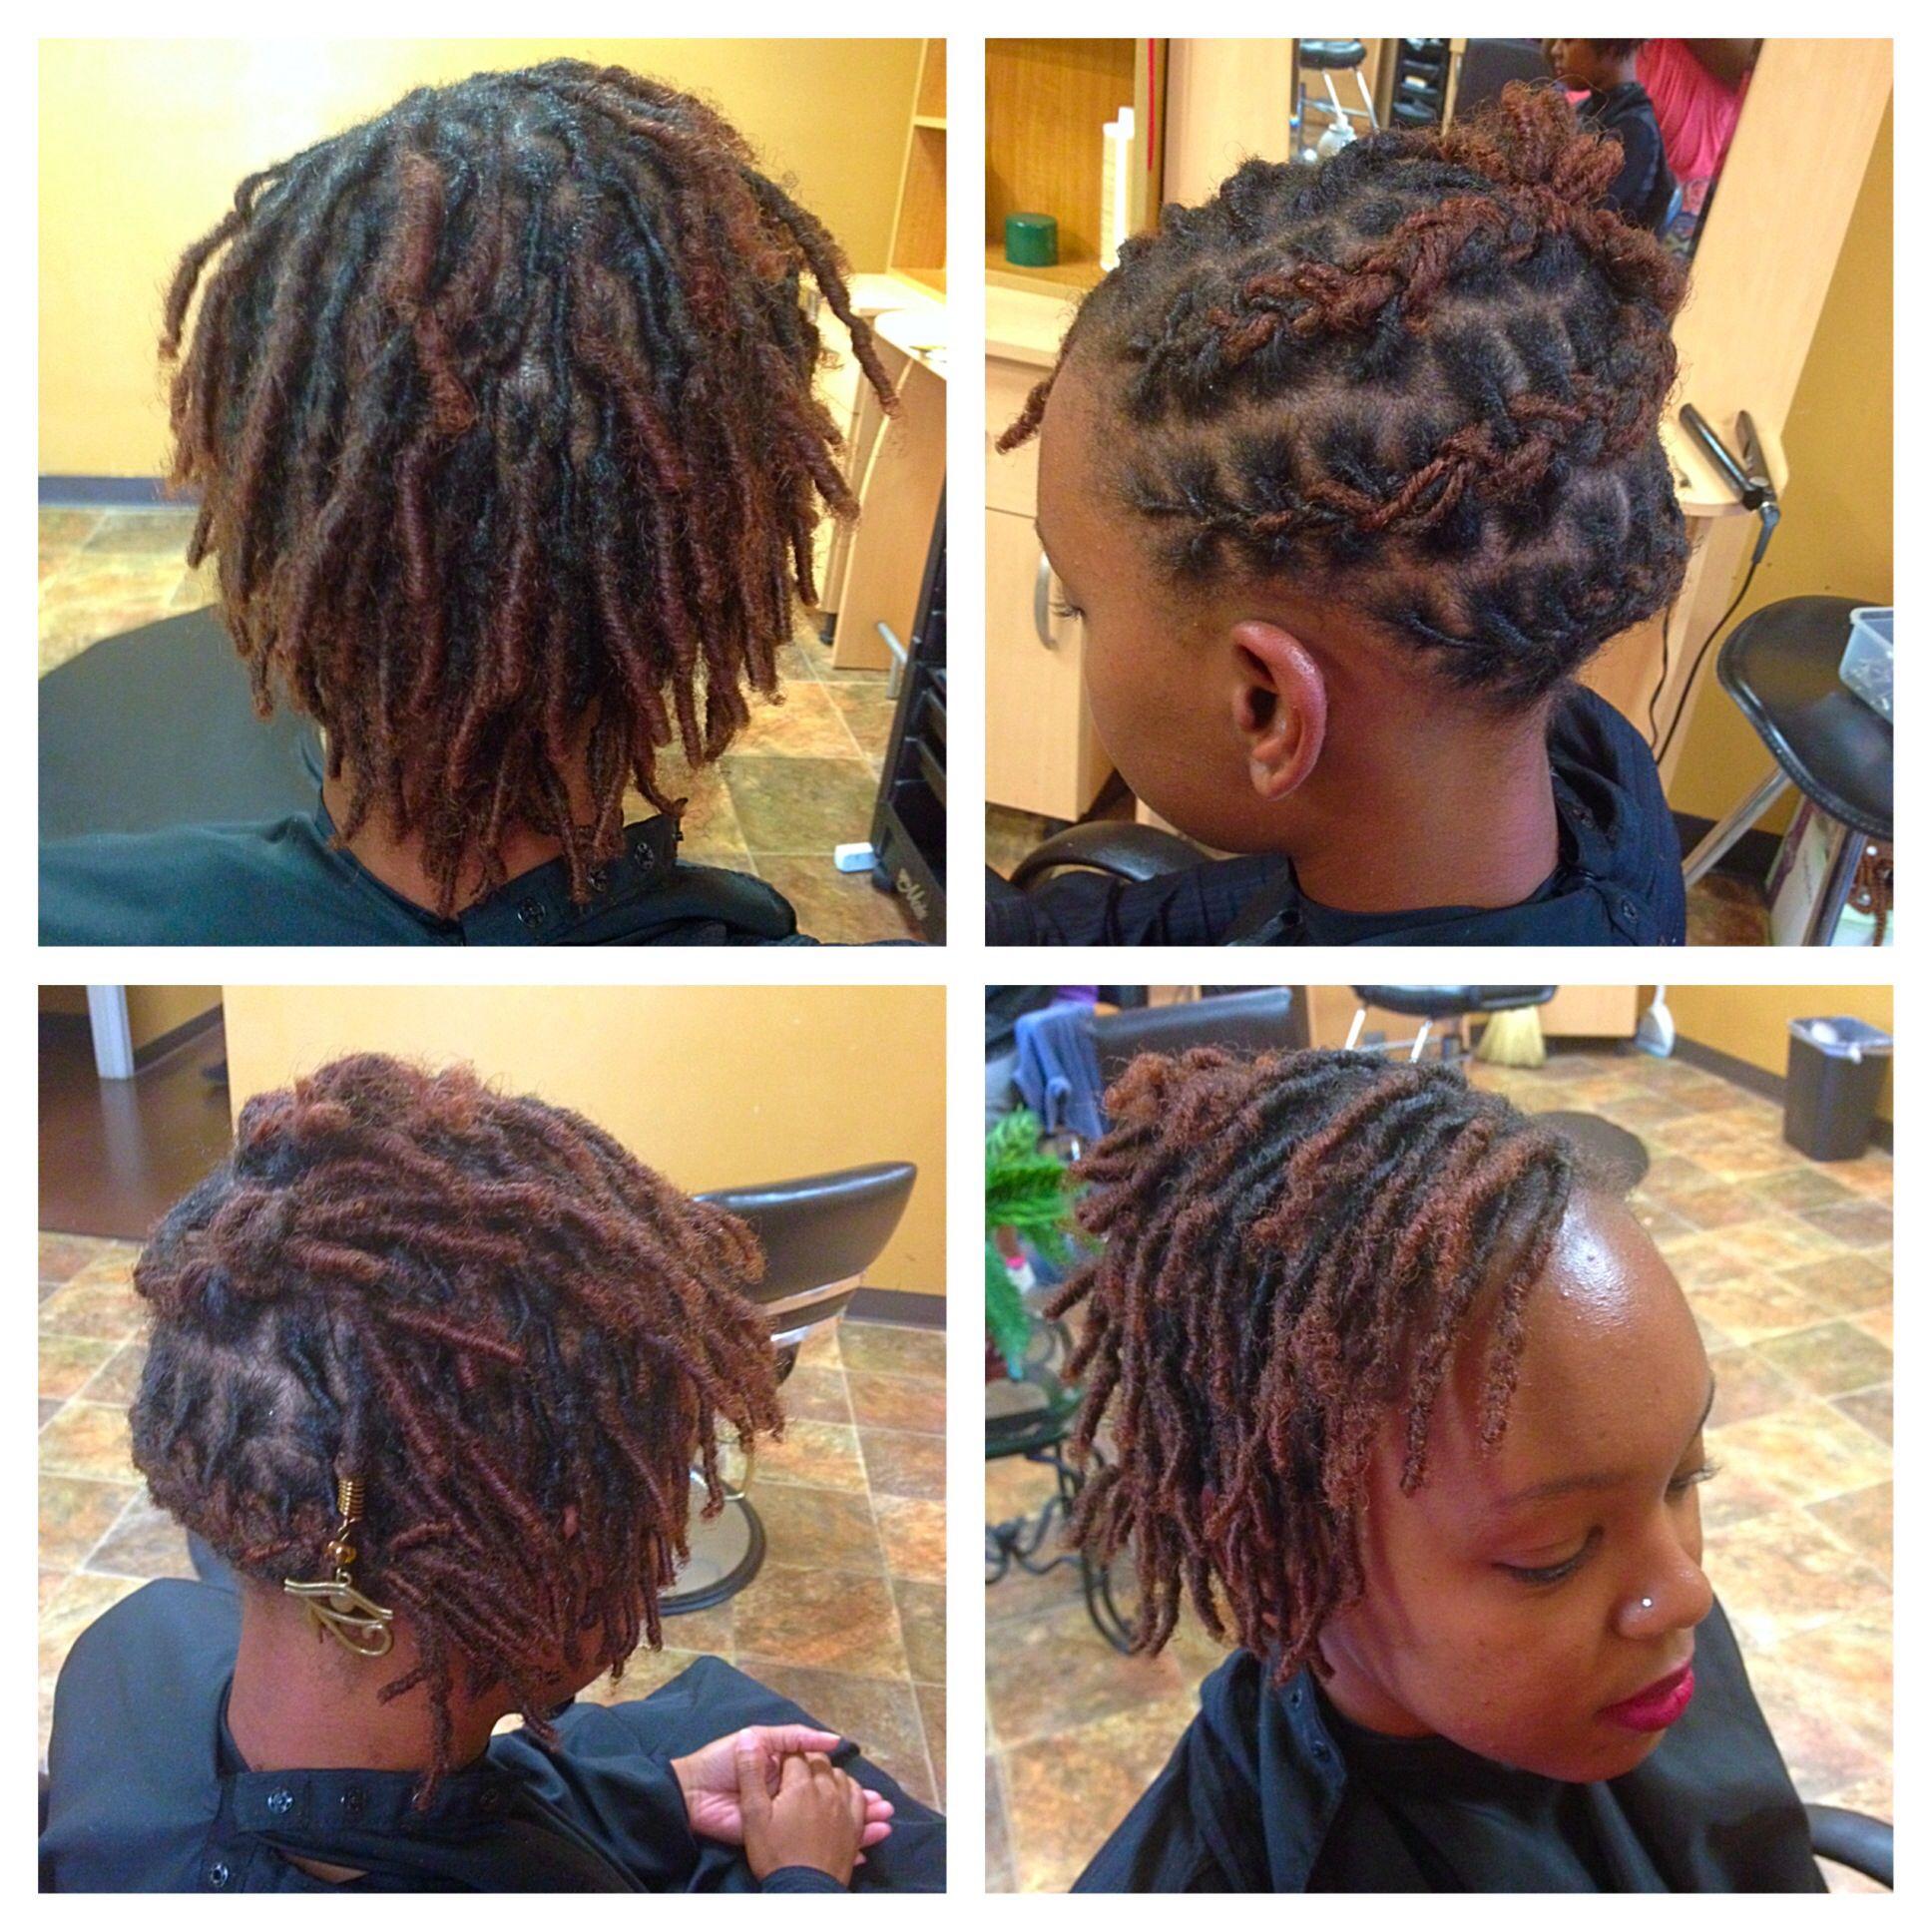 Pin By D Kia On Hair N Body In 2020 Hair Styles Locs Hairstyles Dreads Short Hair